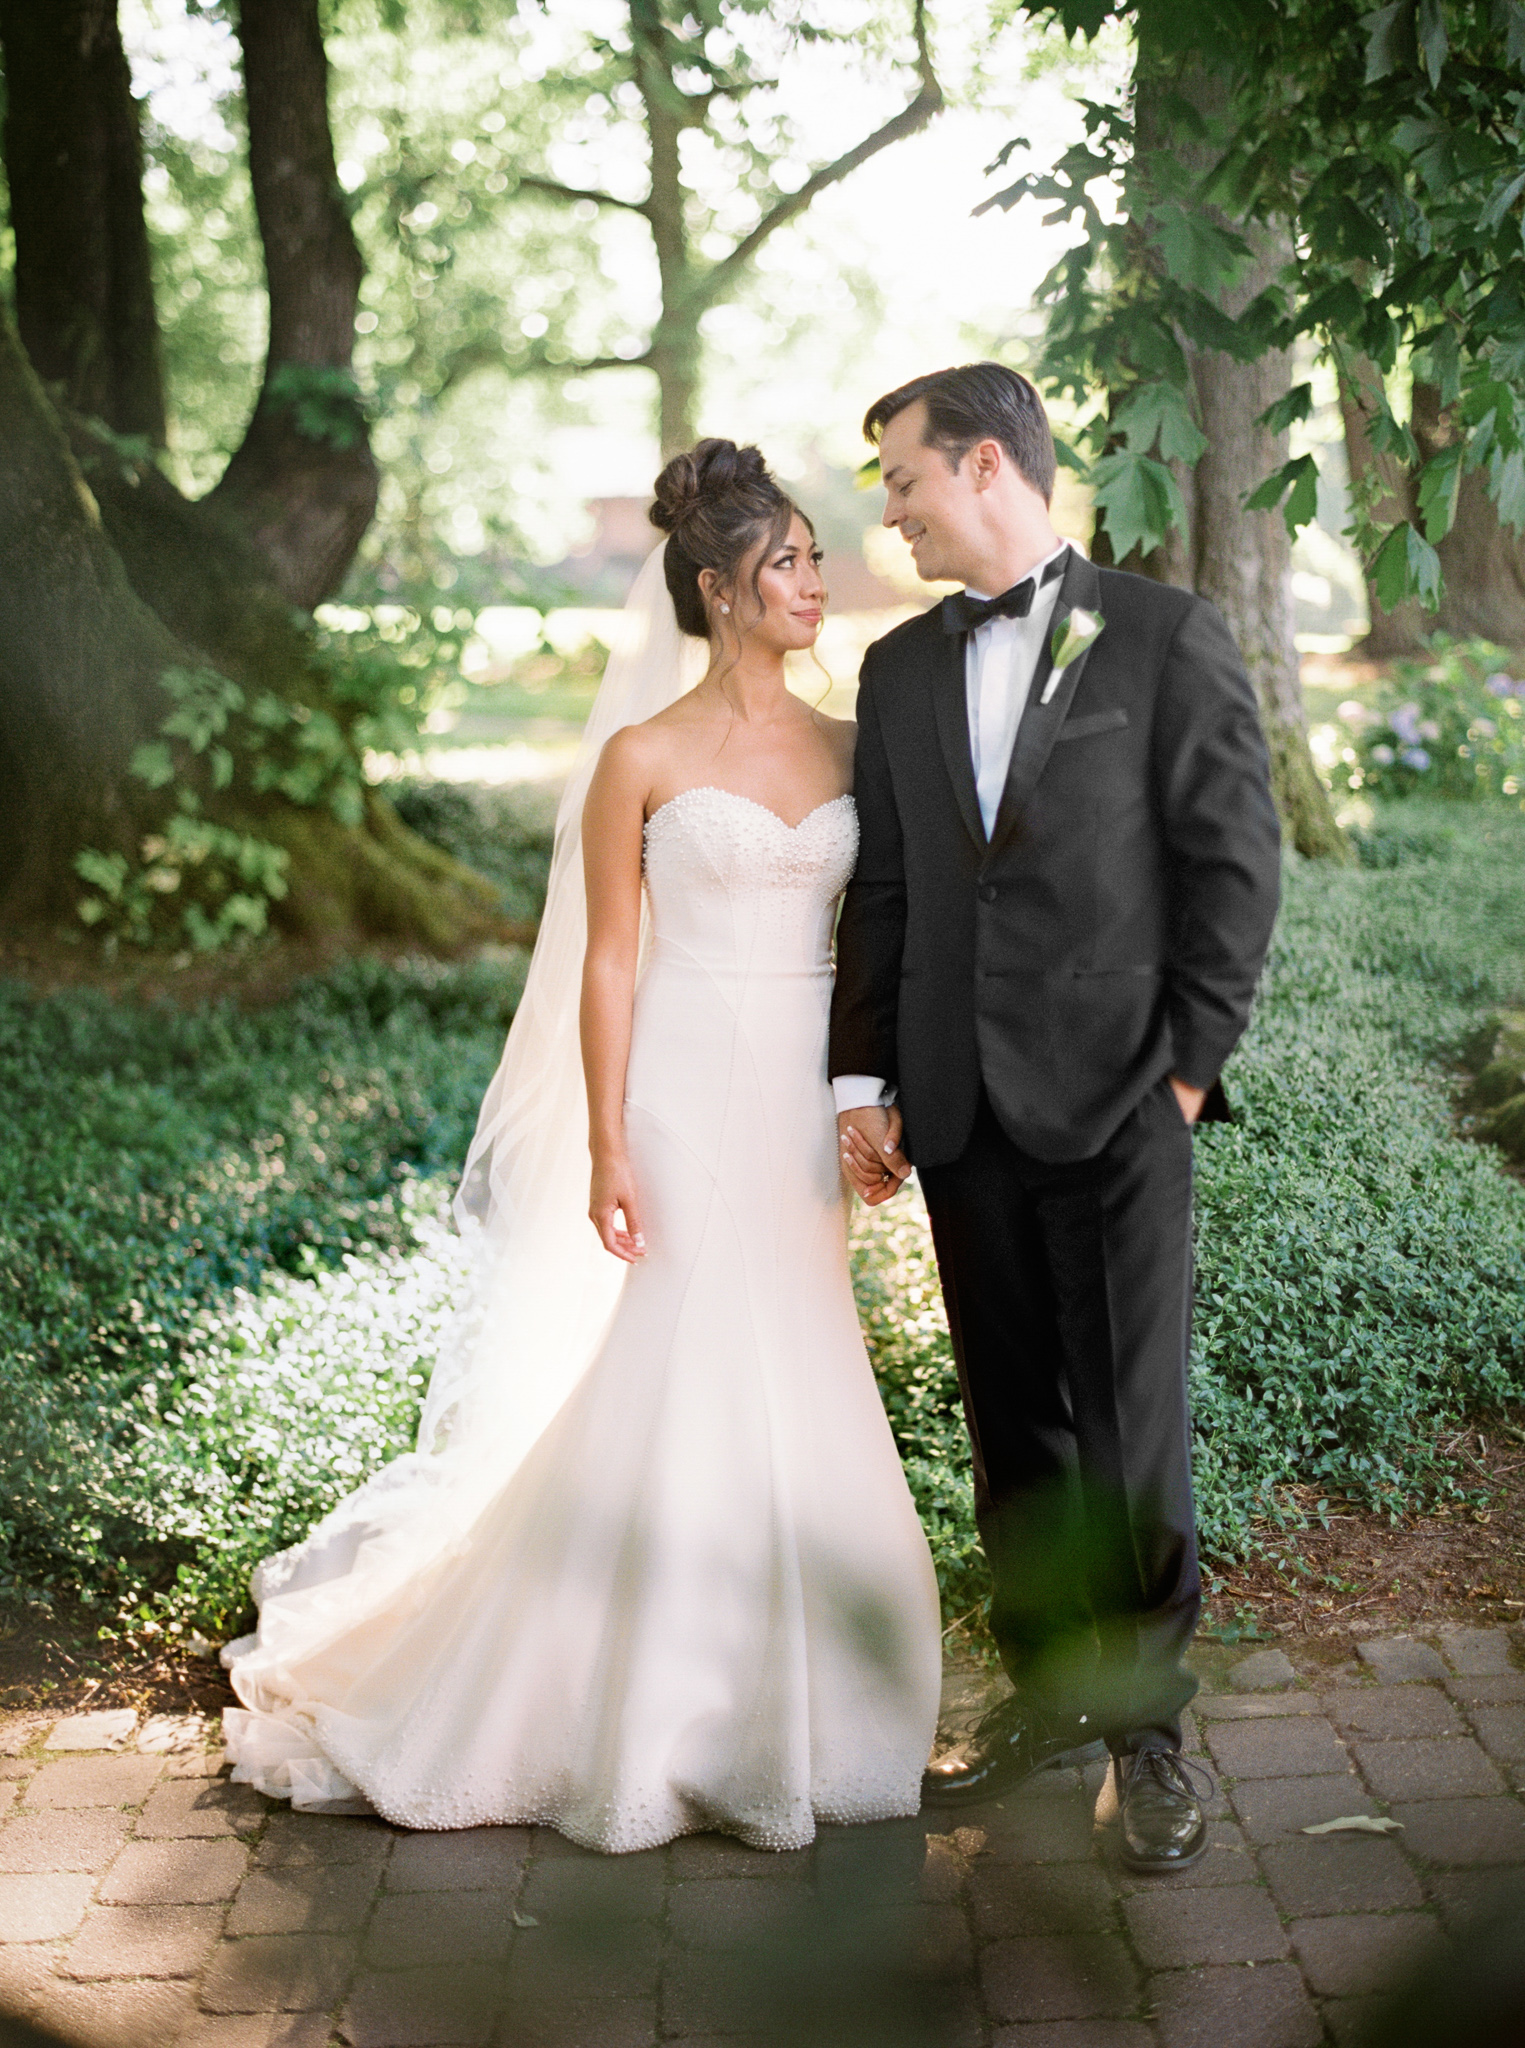 098OutliveCreative_Travel_Photographer_Videographer_Lewis&Clark_Oregon_Elegant_BlackTie_Destination_Wedding.jpg